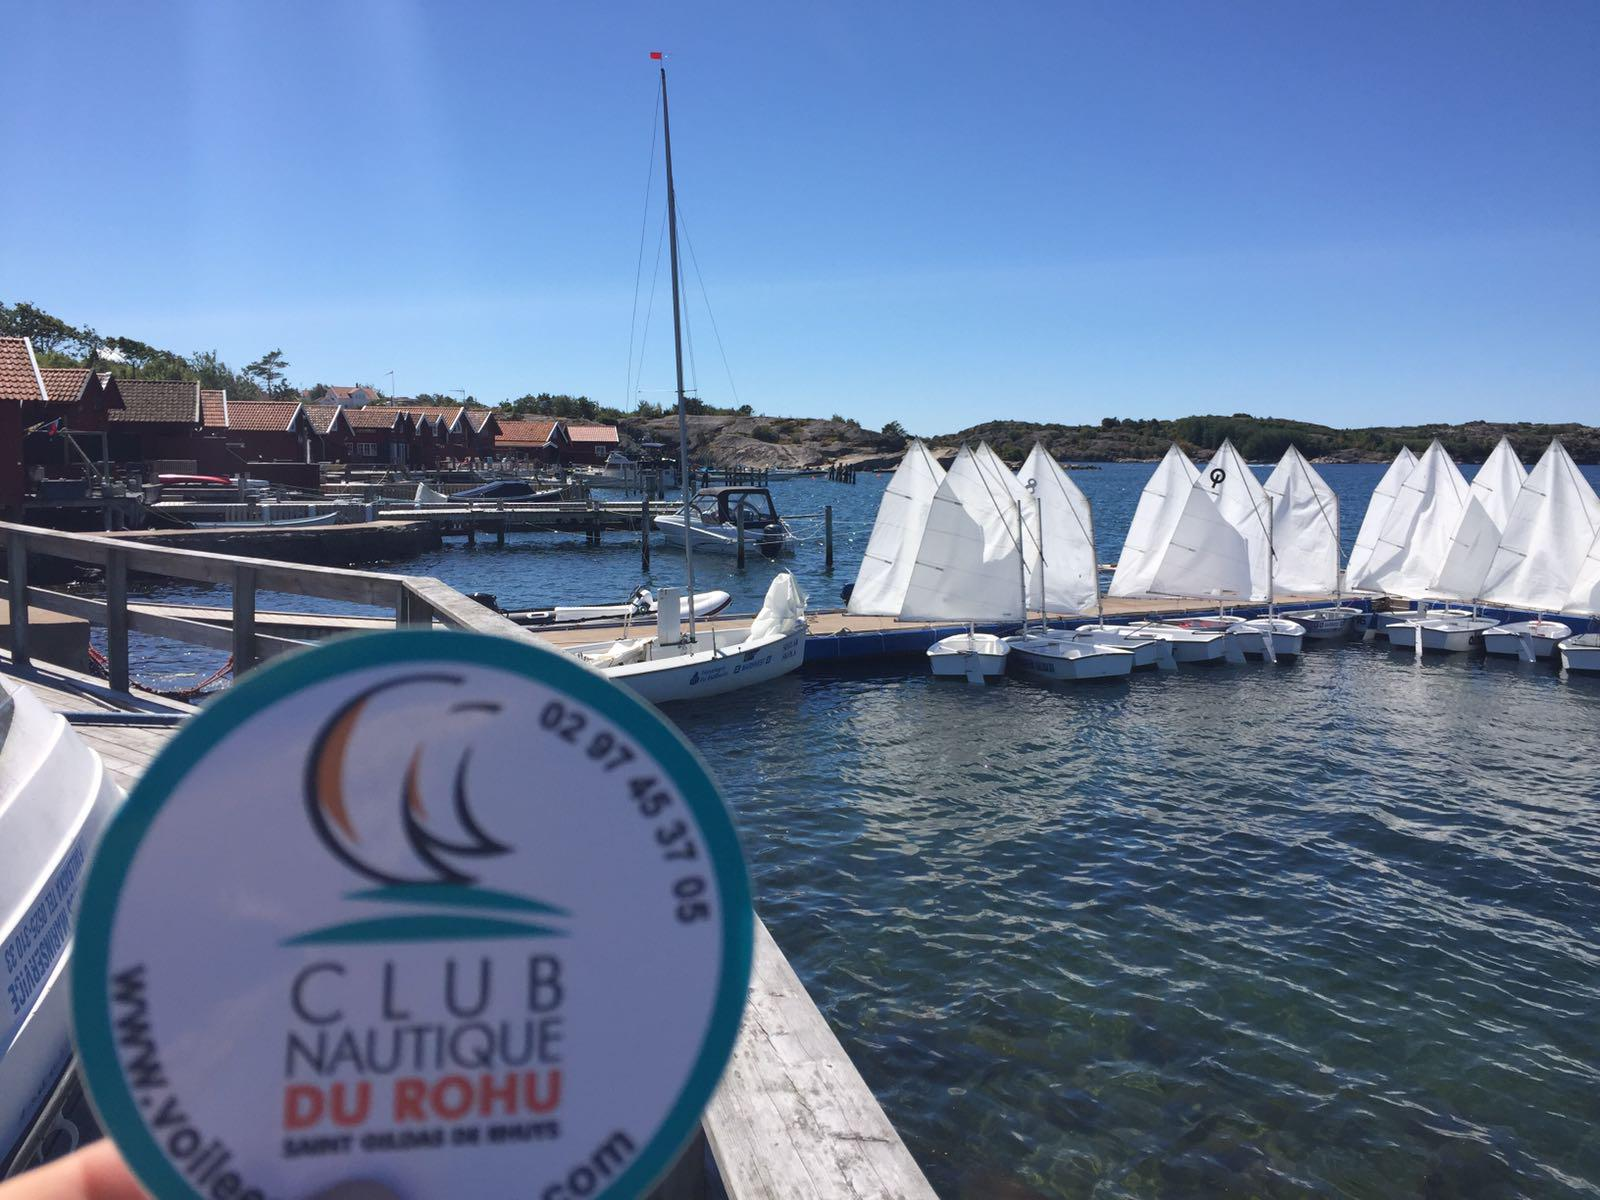 The Club Nautique du Rohu worldwide